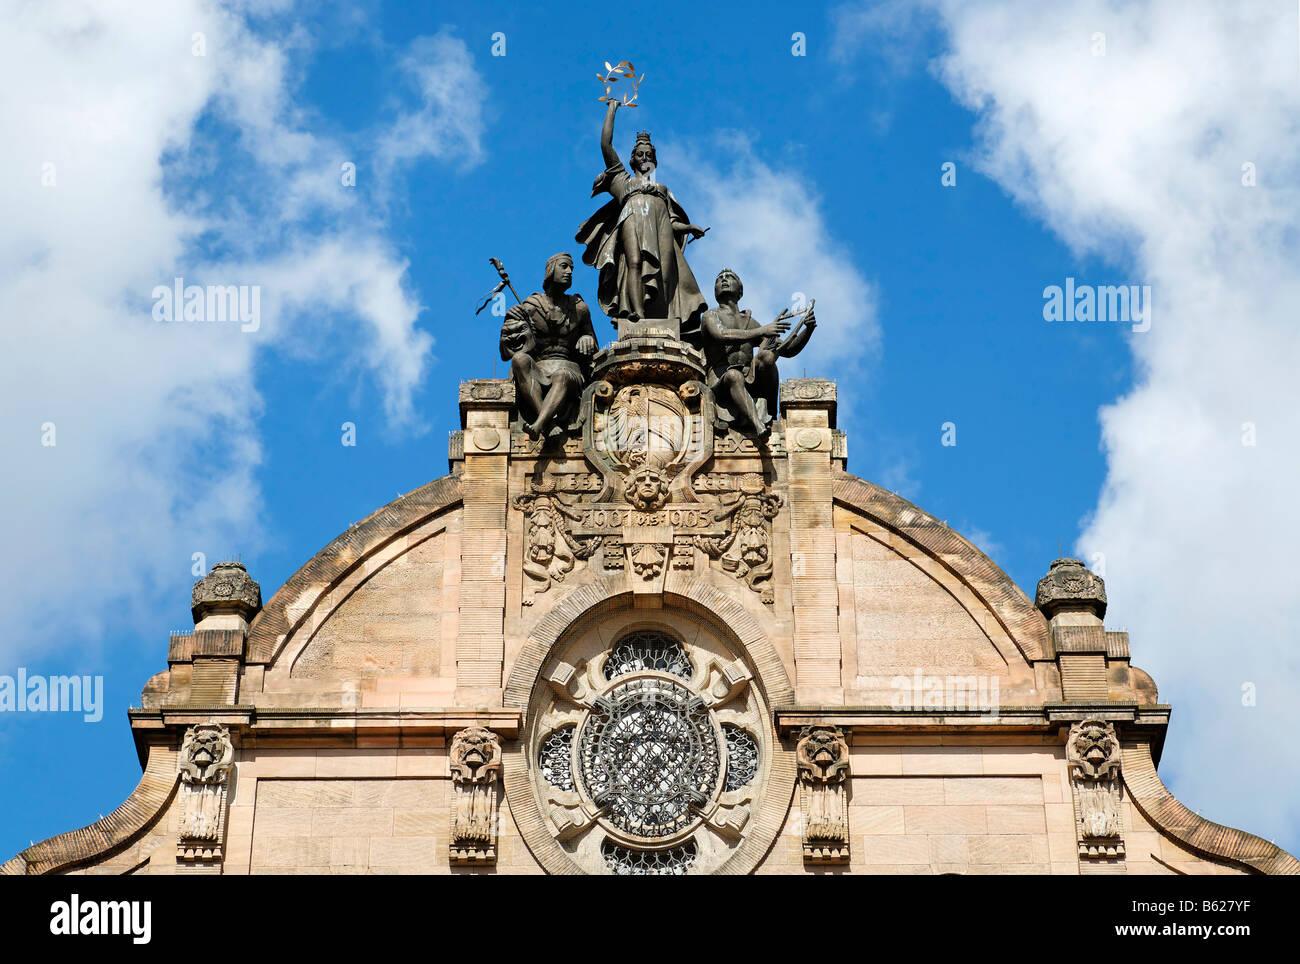 State theatre, opera, gable, art nouveau, Nuremberg, Middle Franconia, Bavaria, Germany, Europe - Stock Image